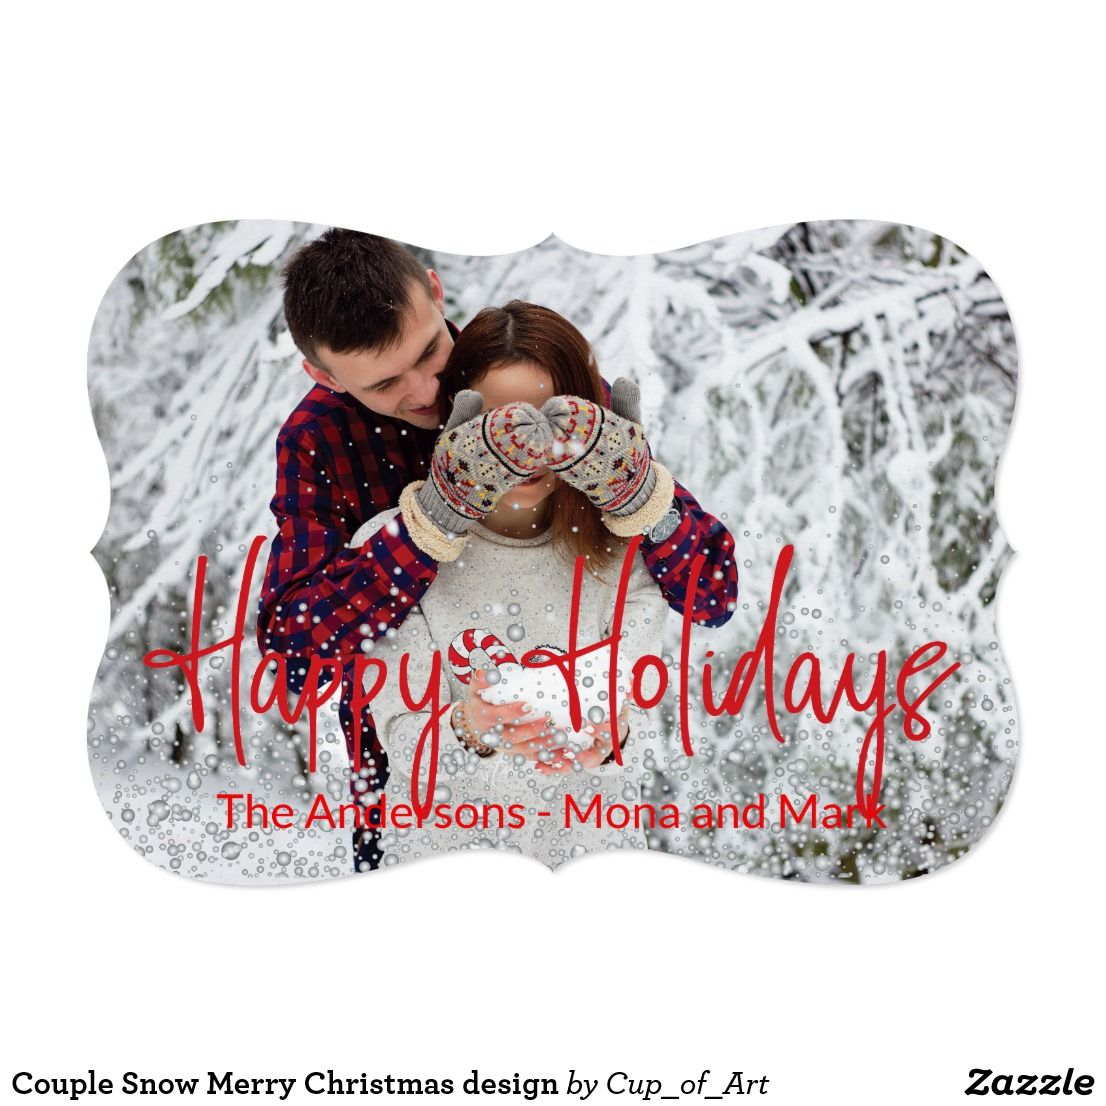 Couple snow merry christmas design holiday card zazzle